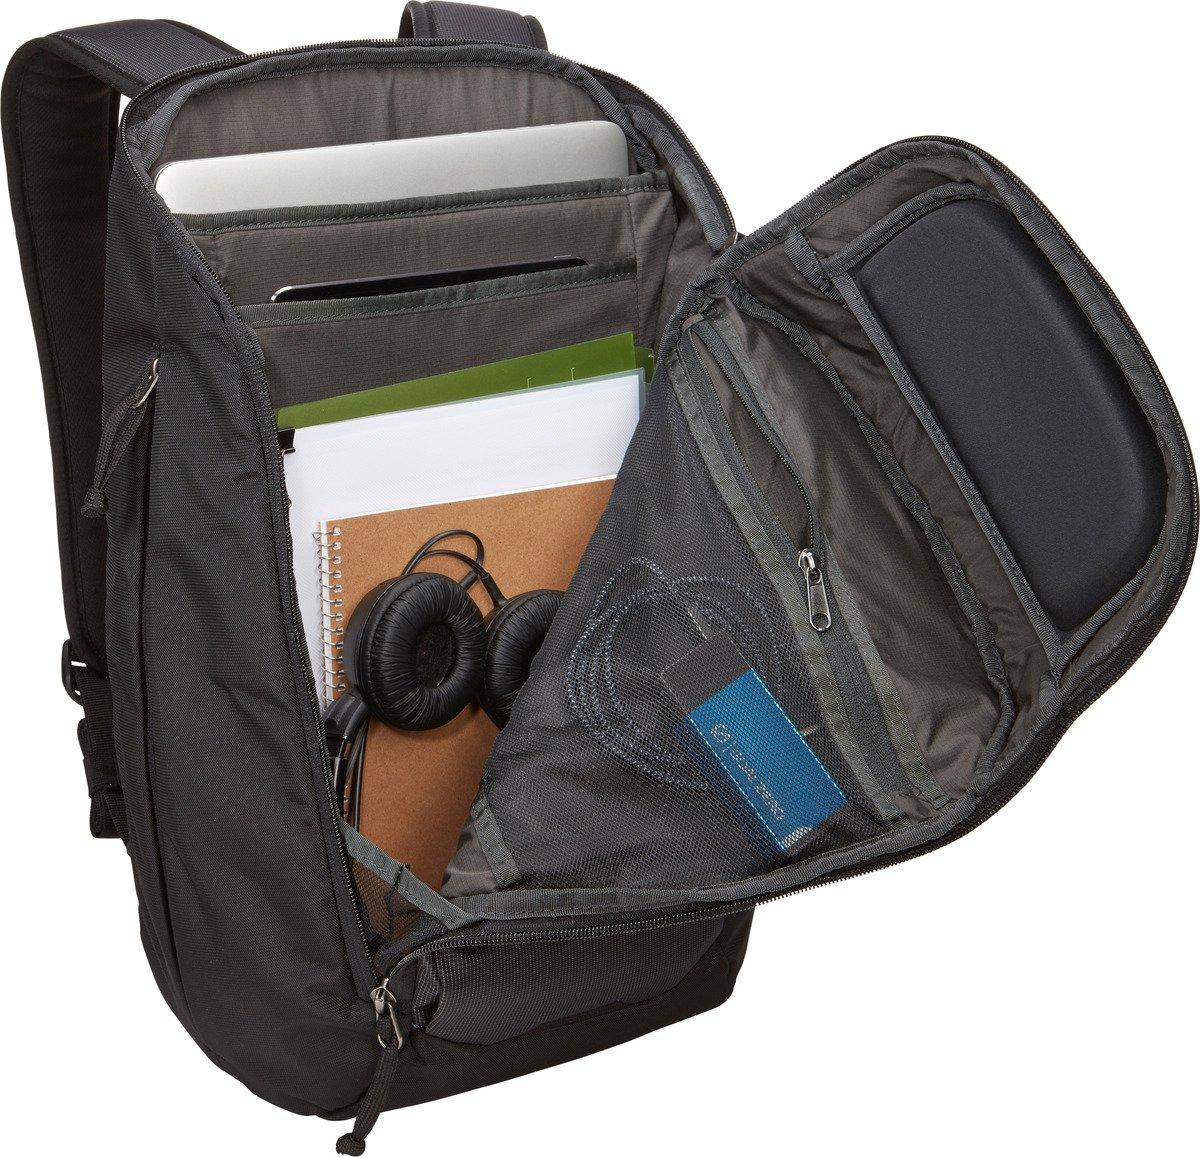 Plecak podróżny turystyczny Thule EnRoute 23L Backpack antracyt